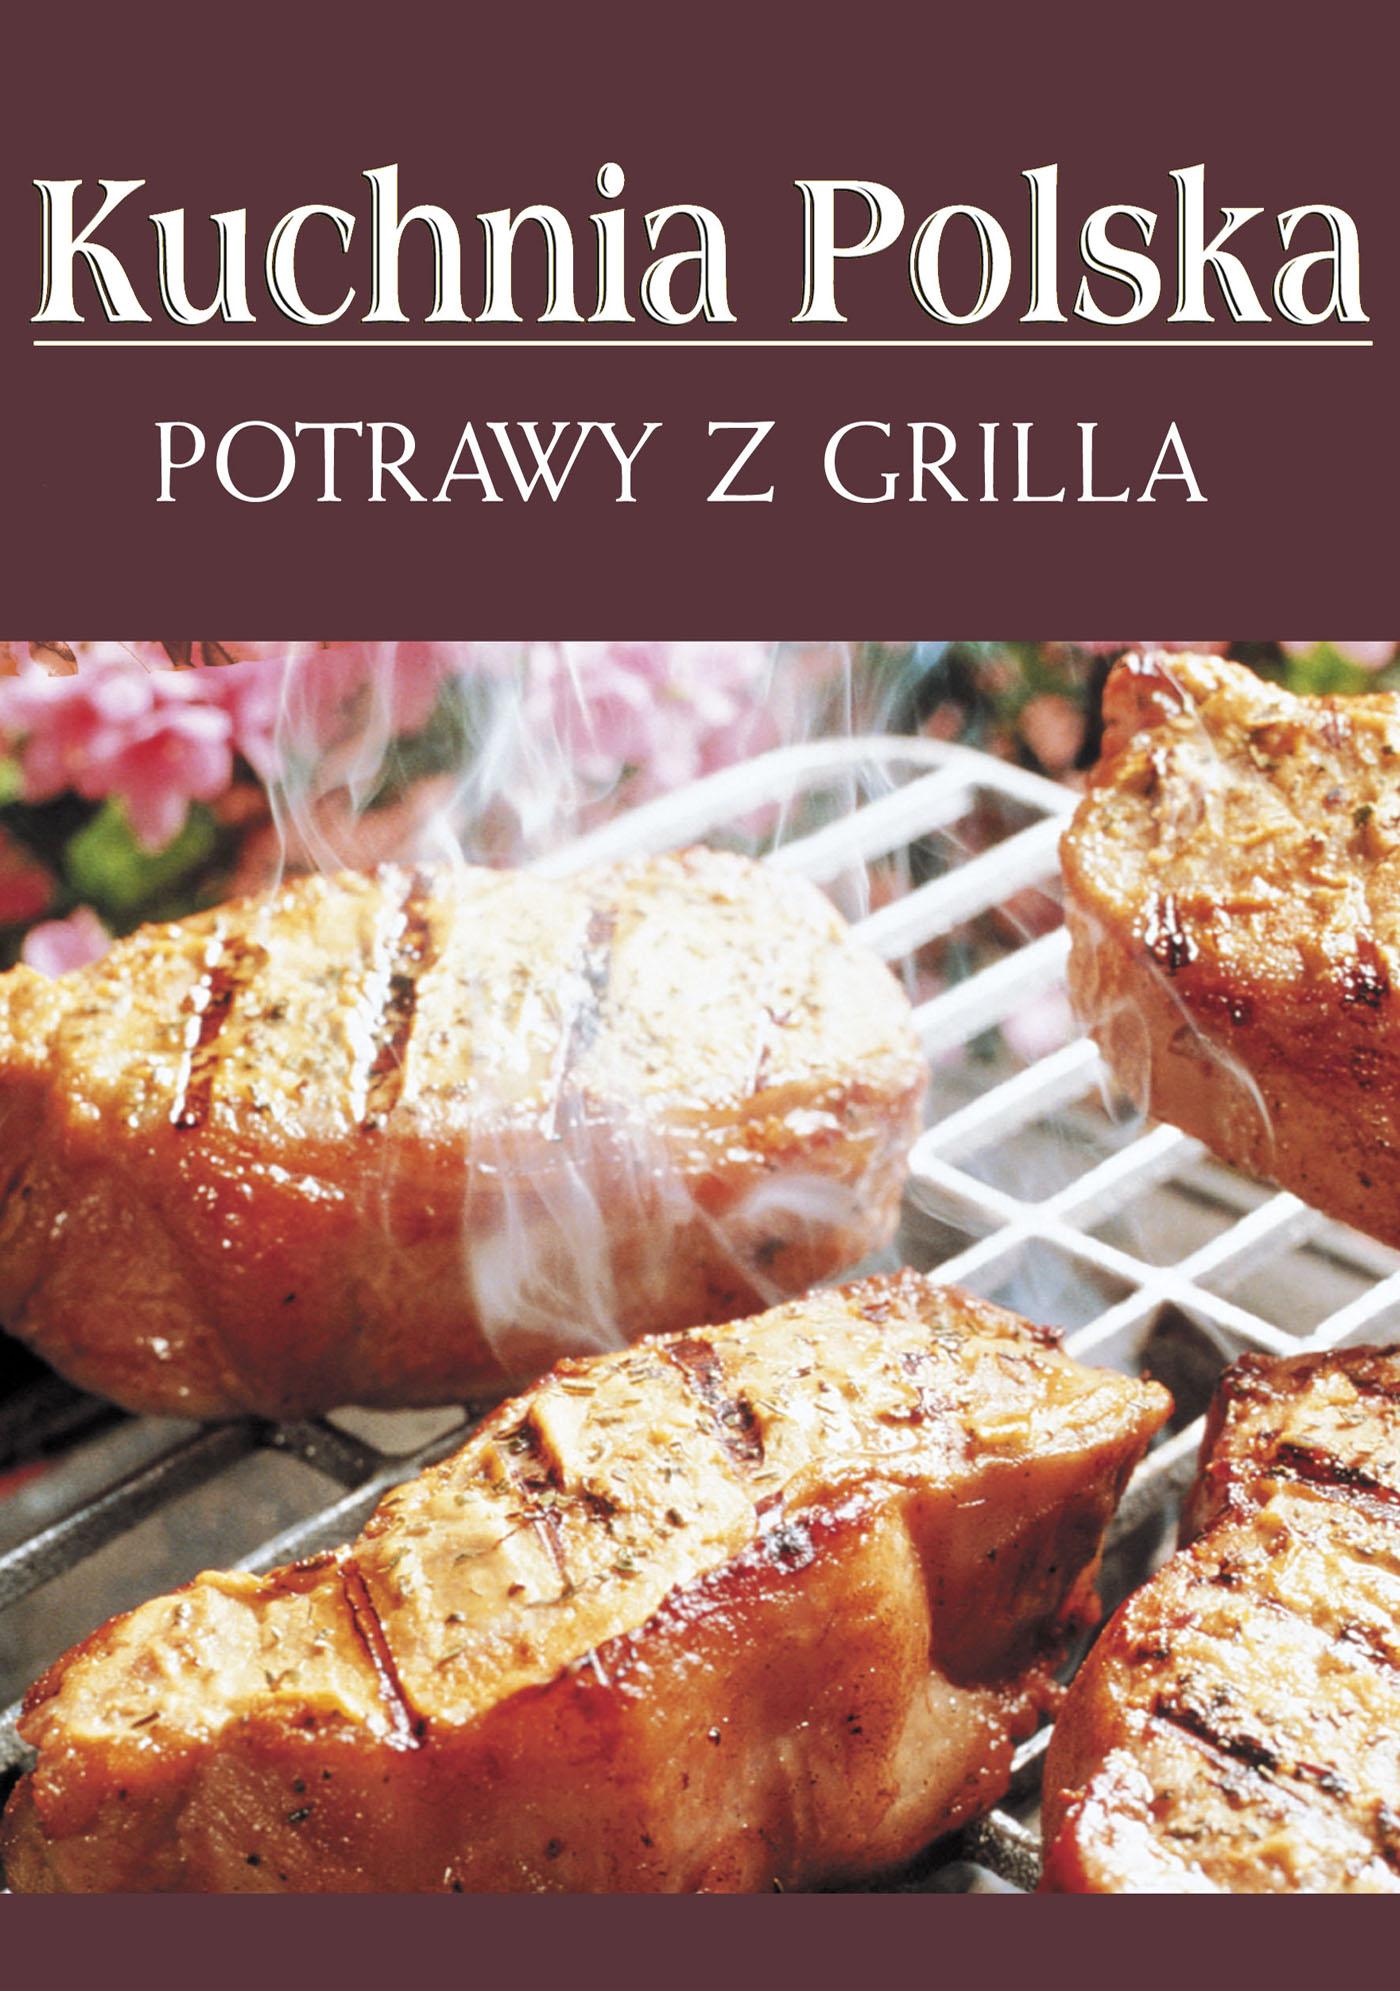 Potrawy z grilla Kuchnia polska  ebook  BezKartek